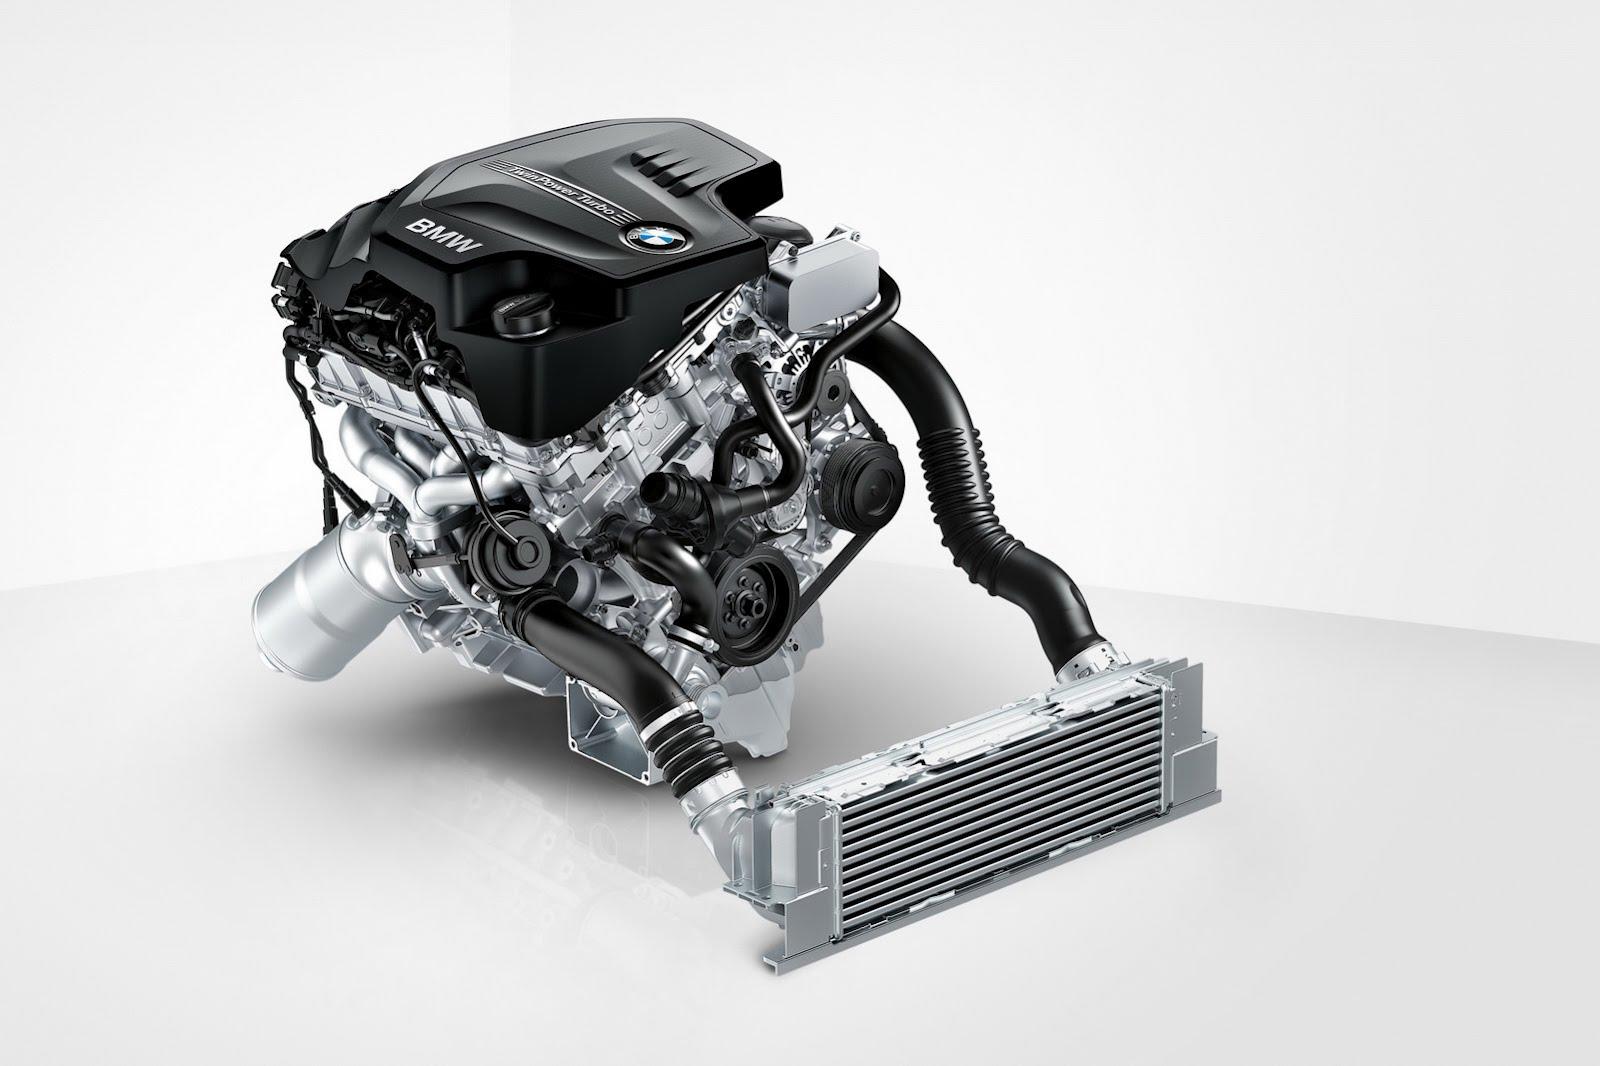 N20 engine